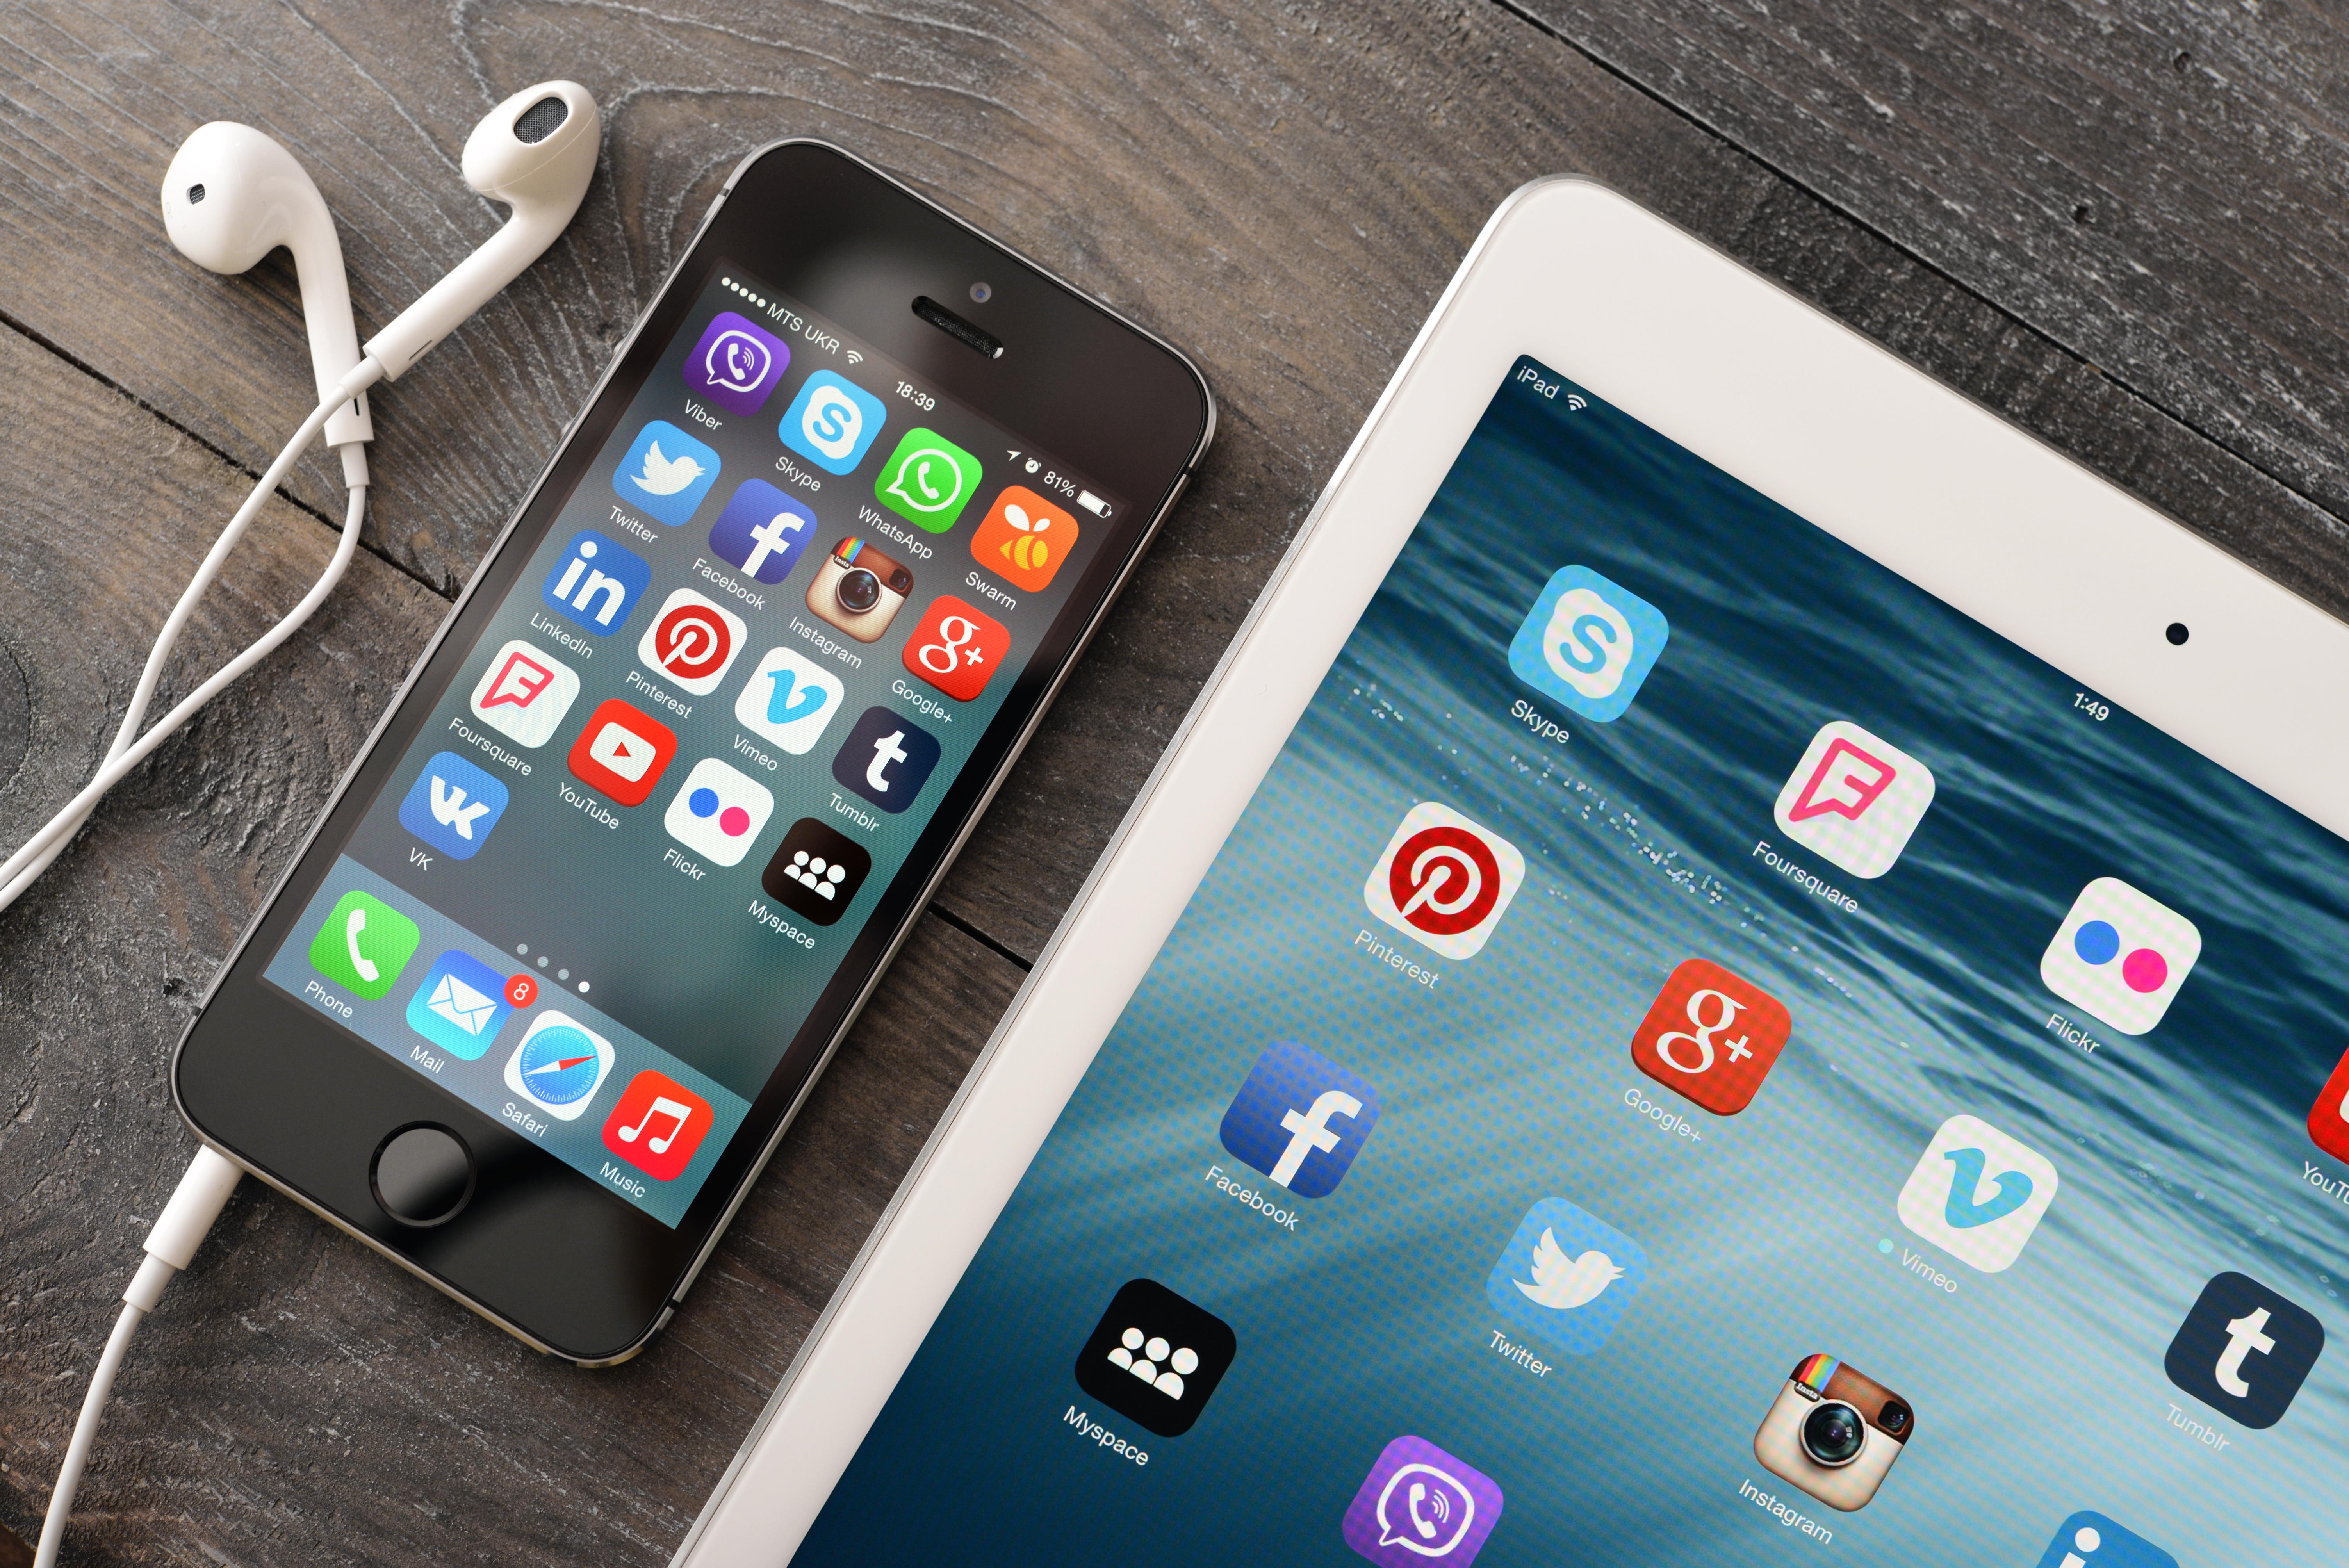 social media management tools free, best social media management tools 2018